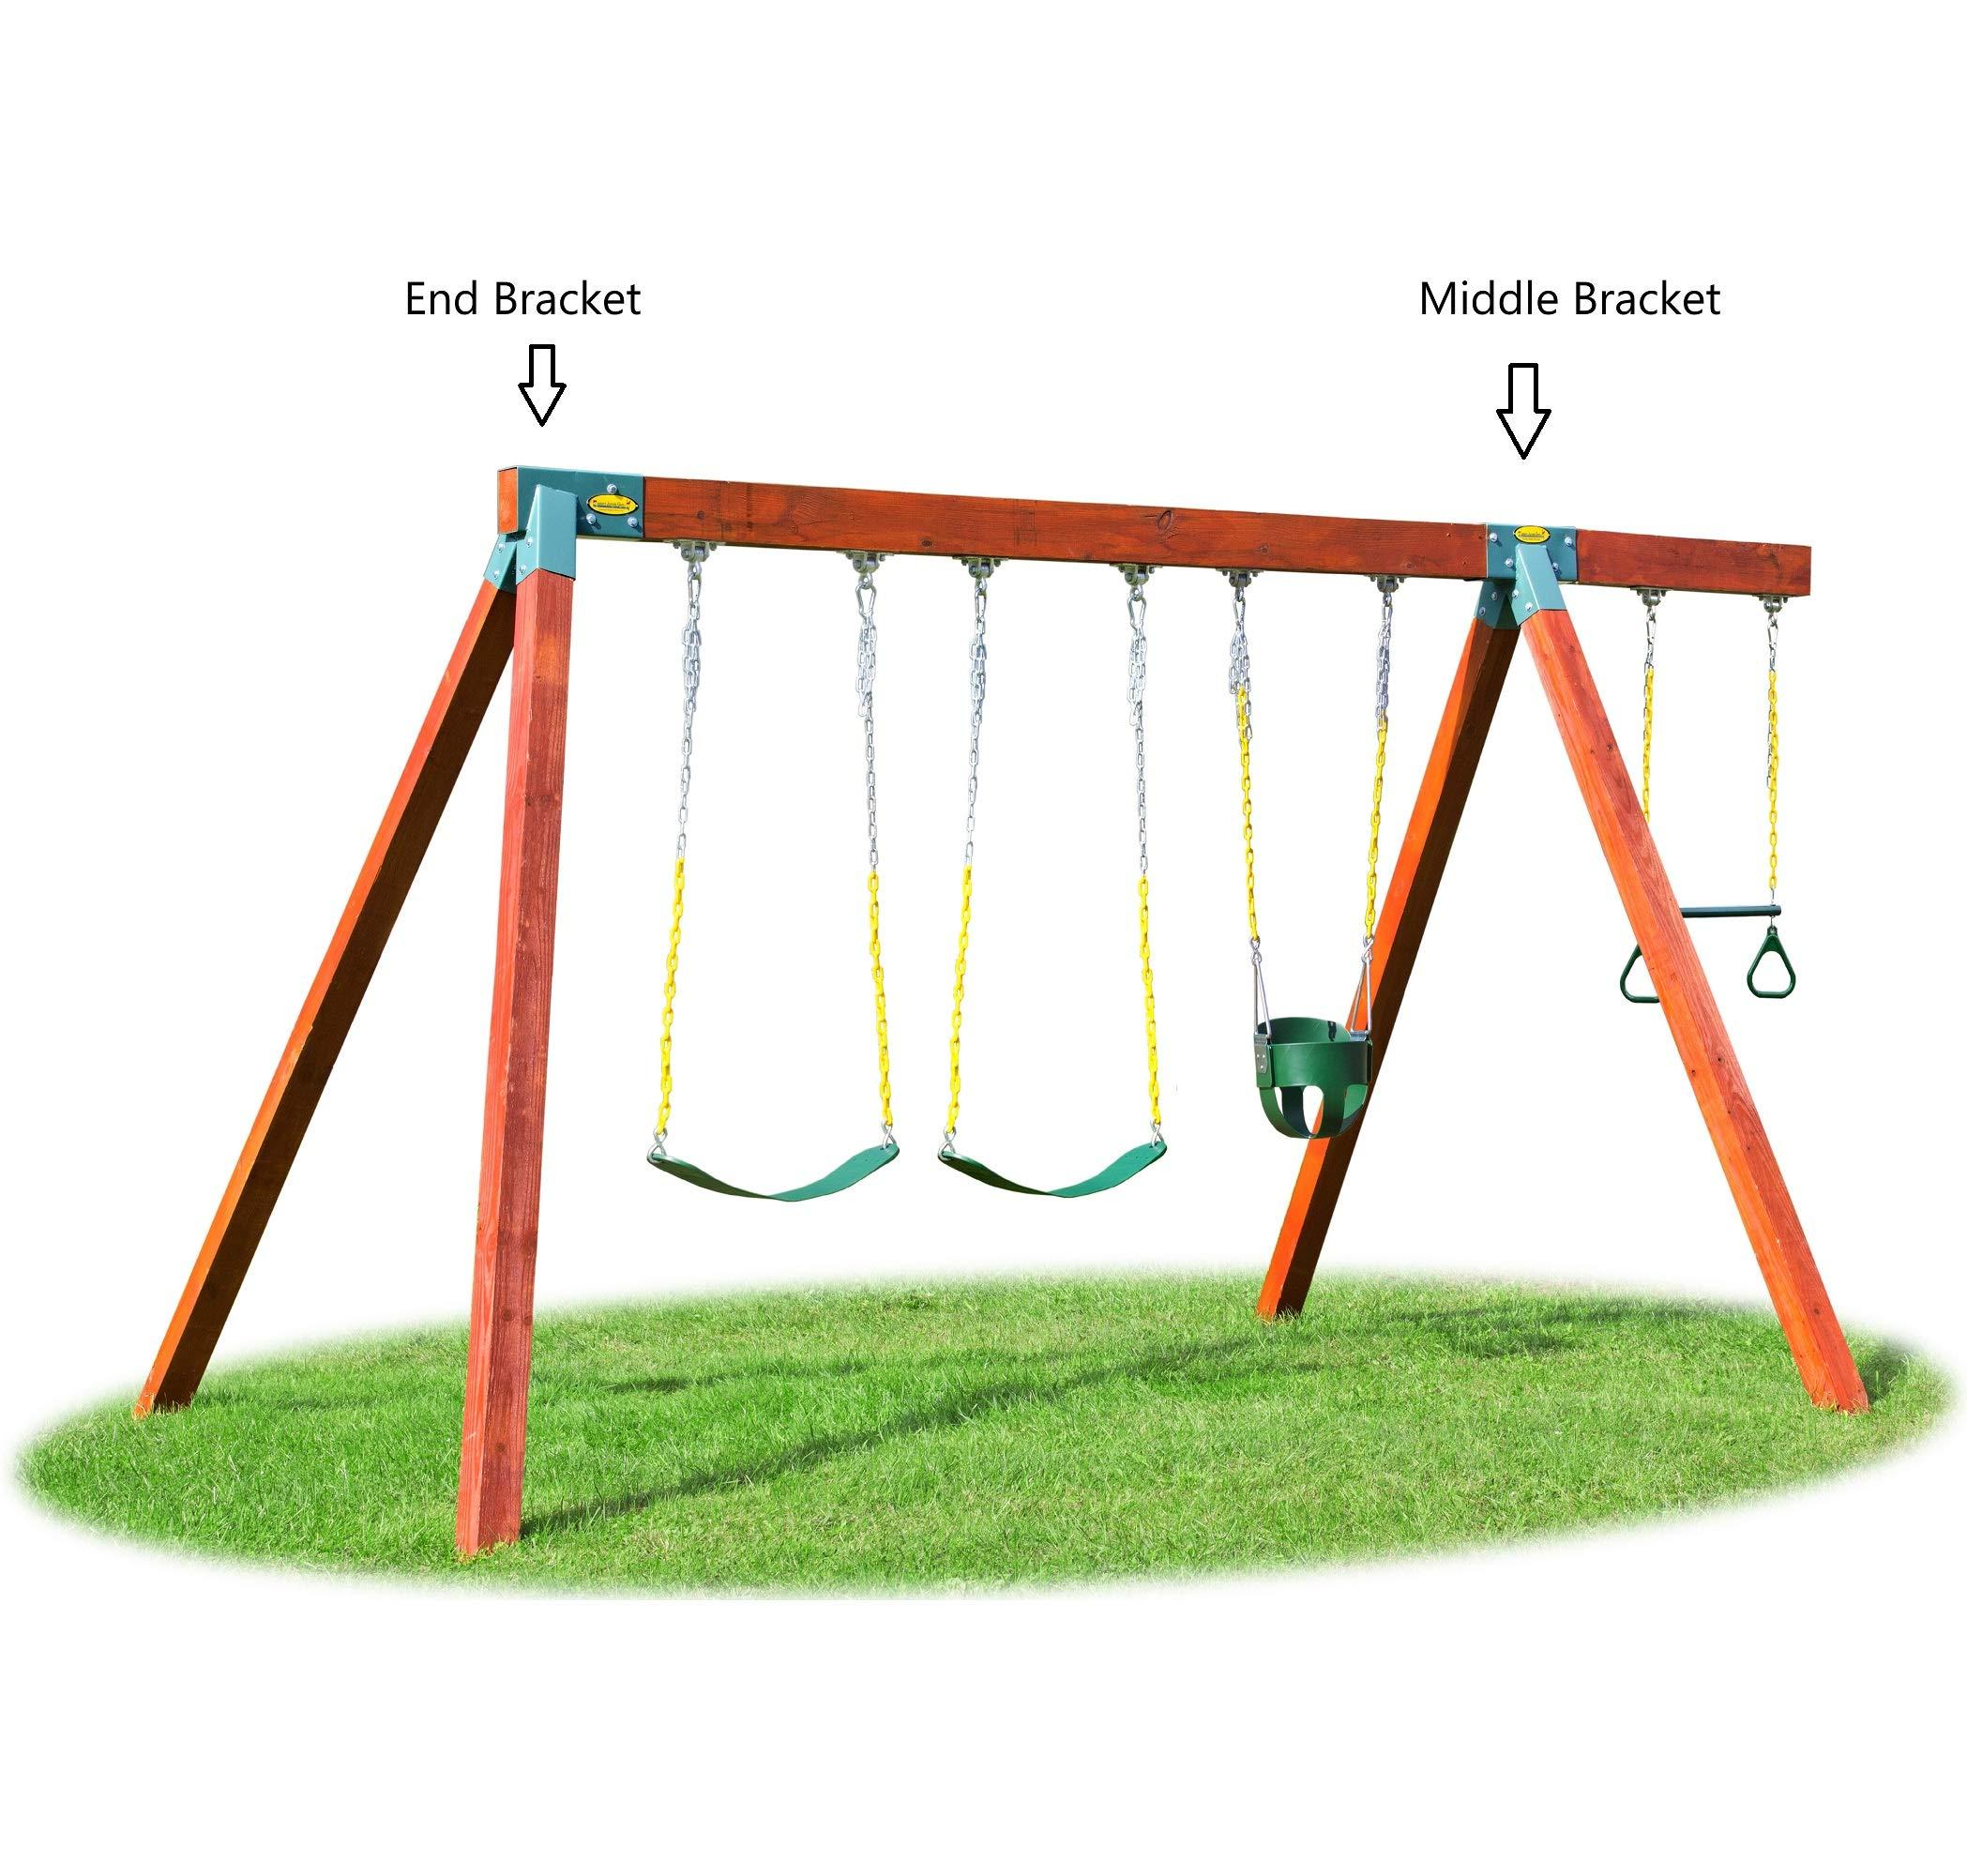 Eastern Jungle Gym Easy 1-2-3 A-Frame Swing Set Bracket Heavy Duty ...